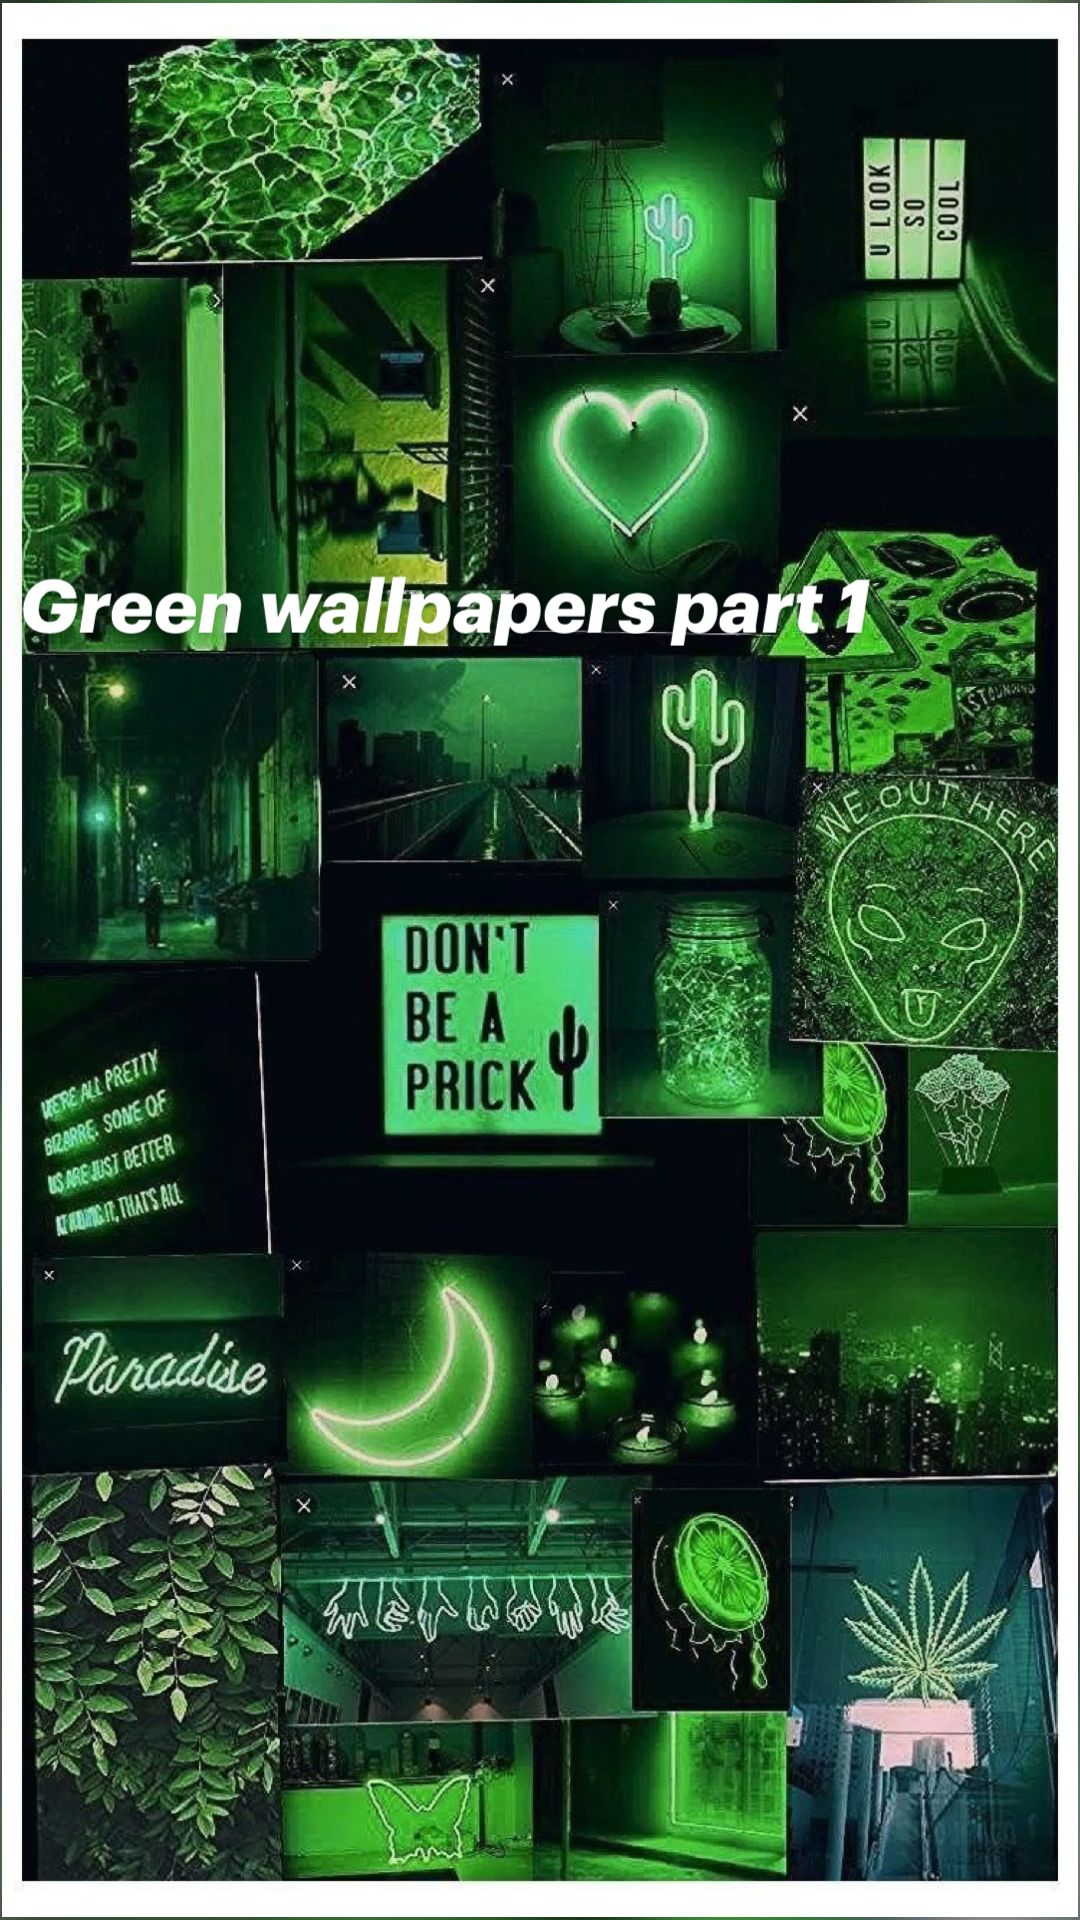 Green wallpapers part 1